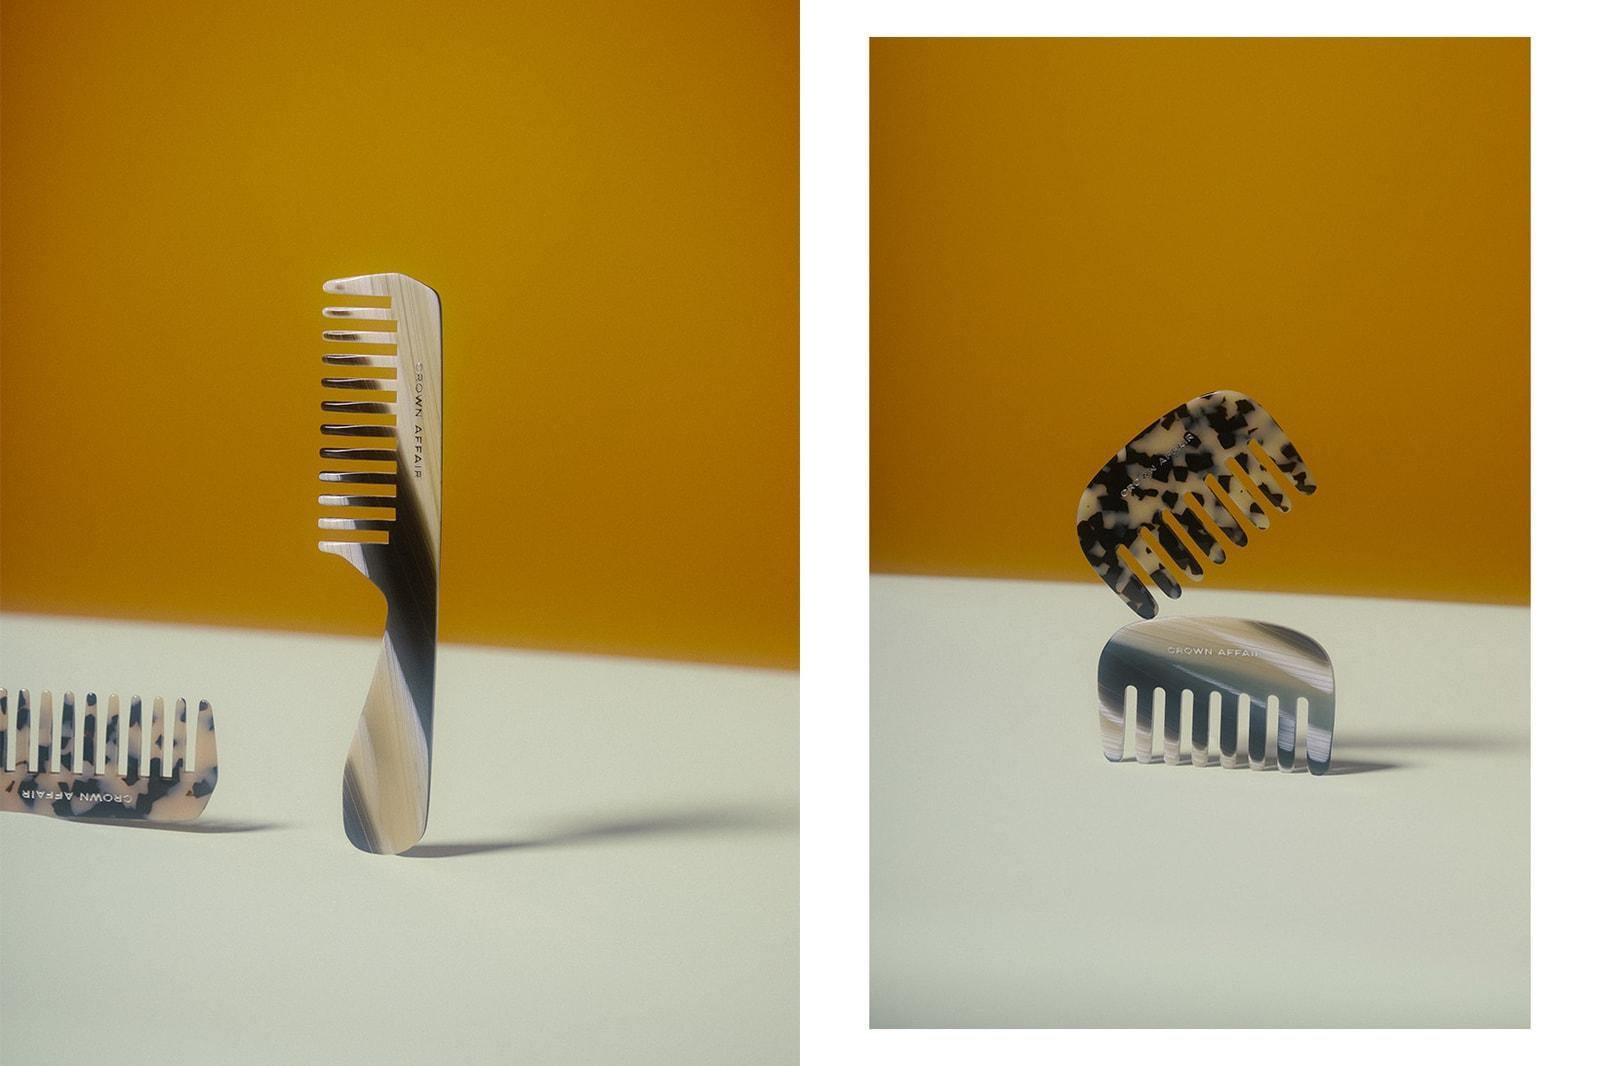 haircare brush comb crown affair no. 001 002